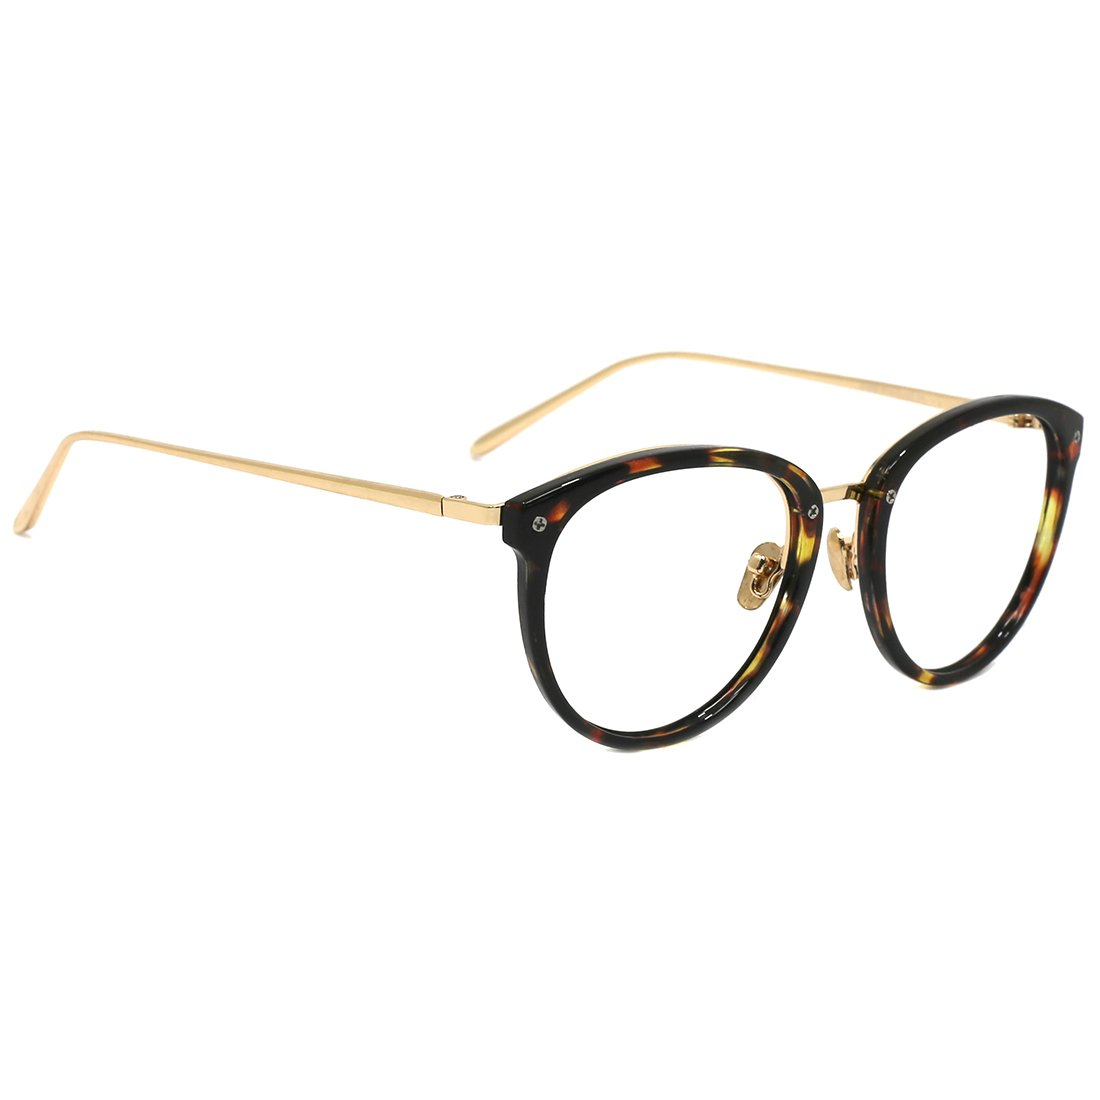 TIJN Round Blue Light Filter Computer Glasses Eyeglasses for Women Transparent Lens((Blue Light Block) Tortoise, 50) by TIJN (Image #2)